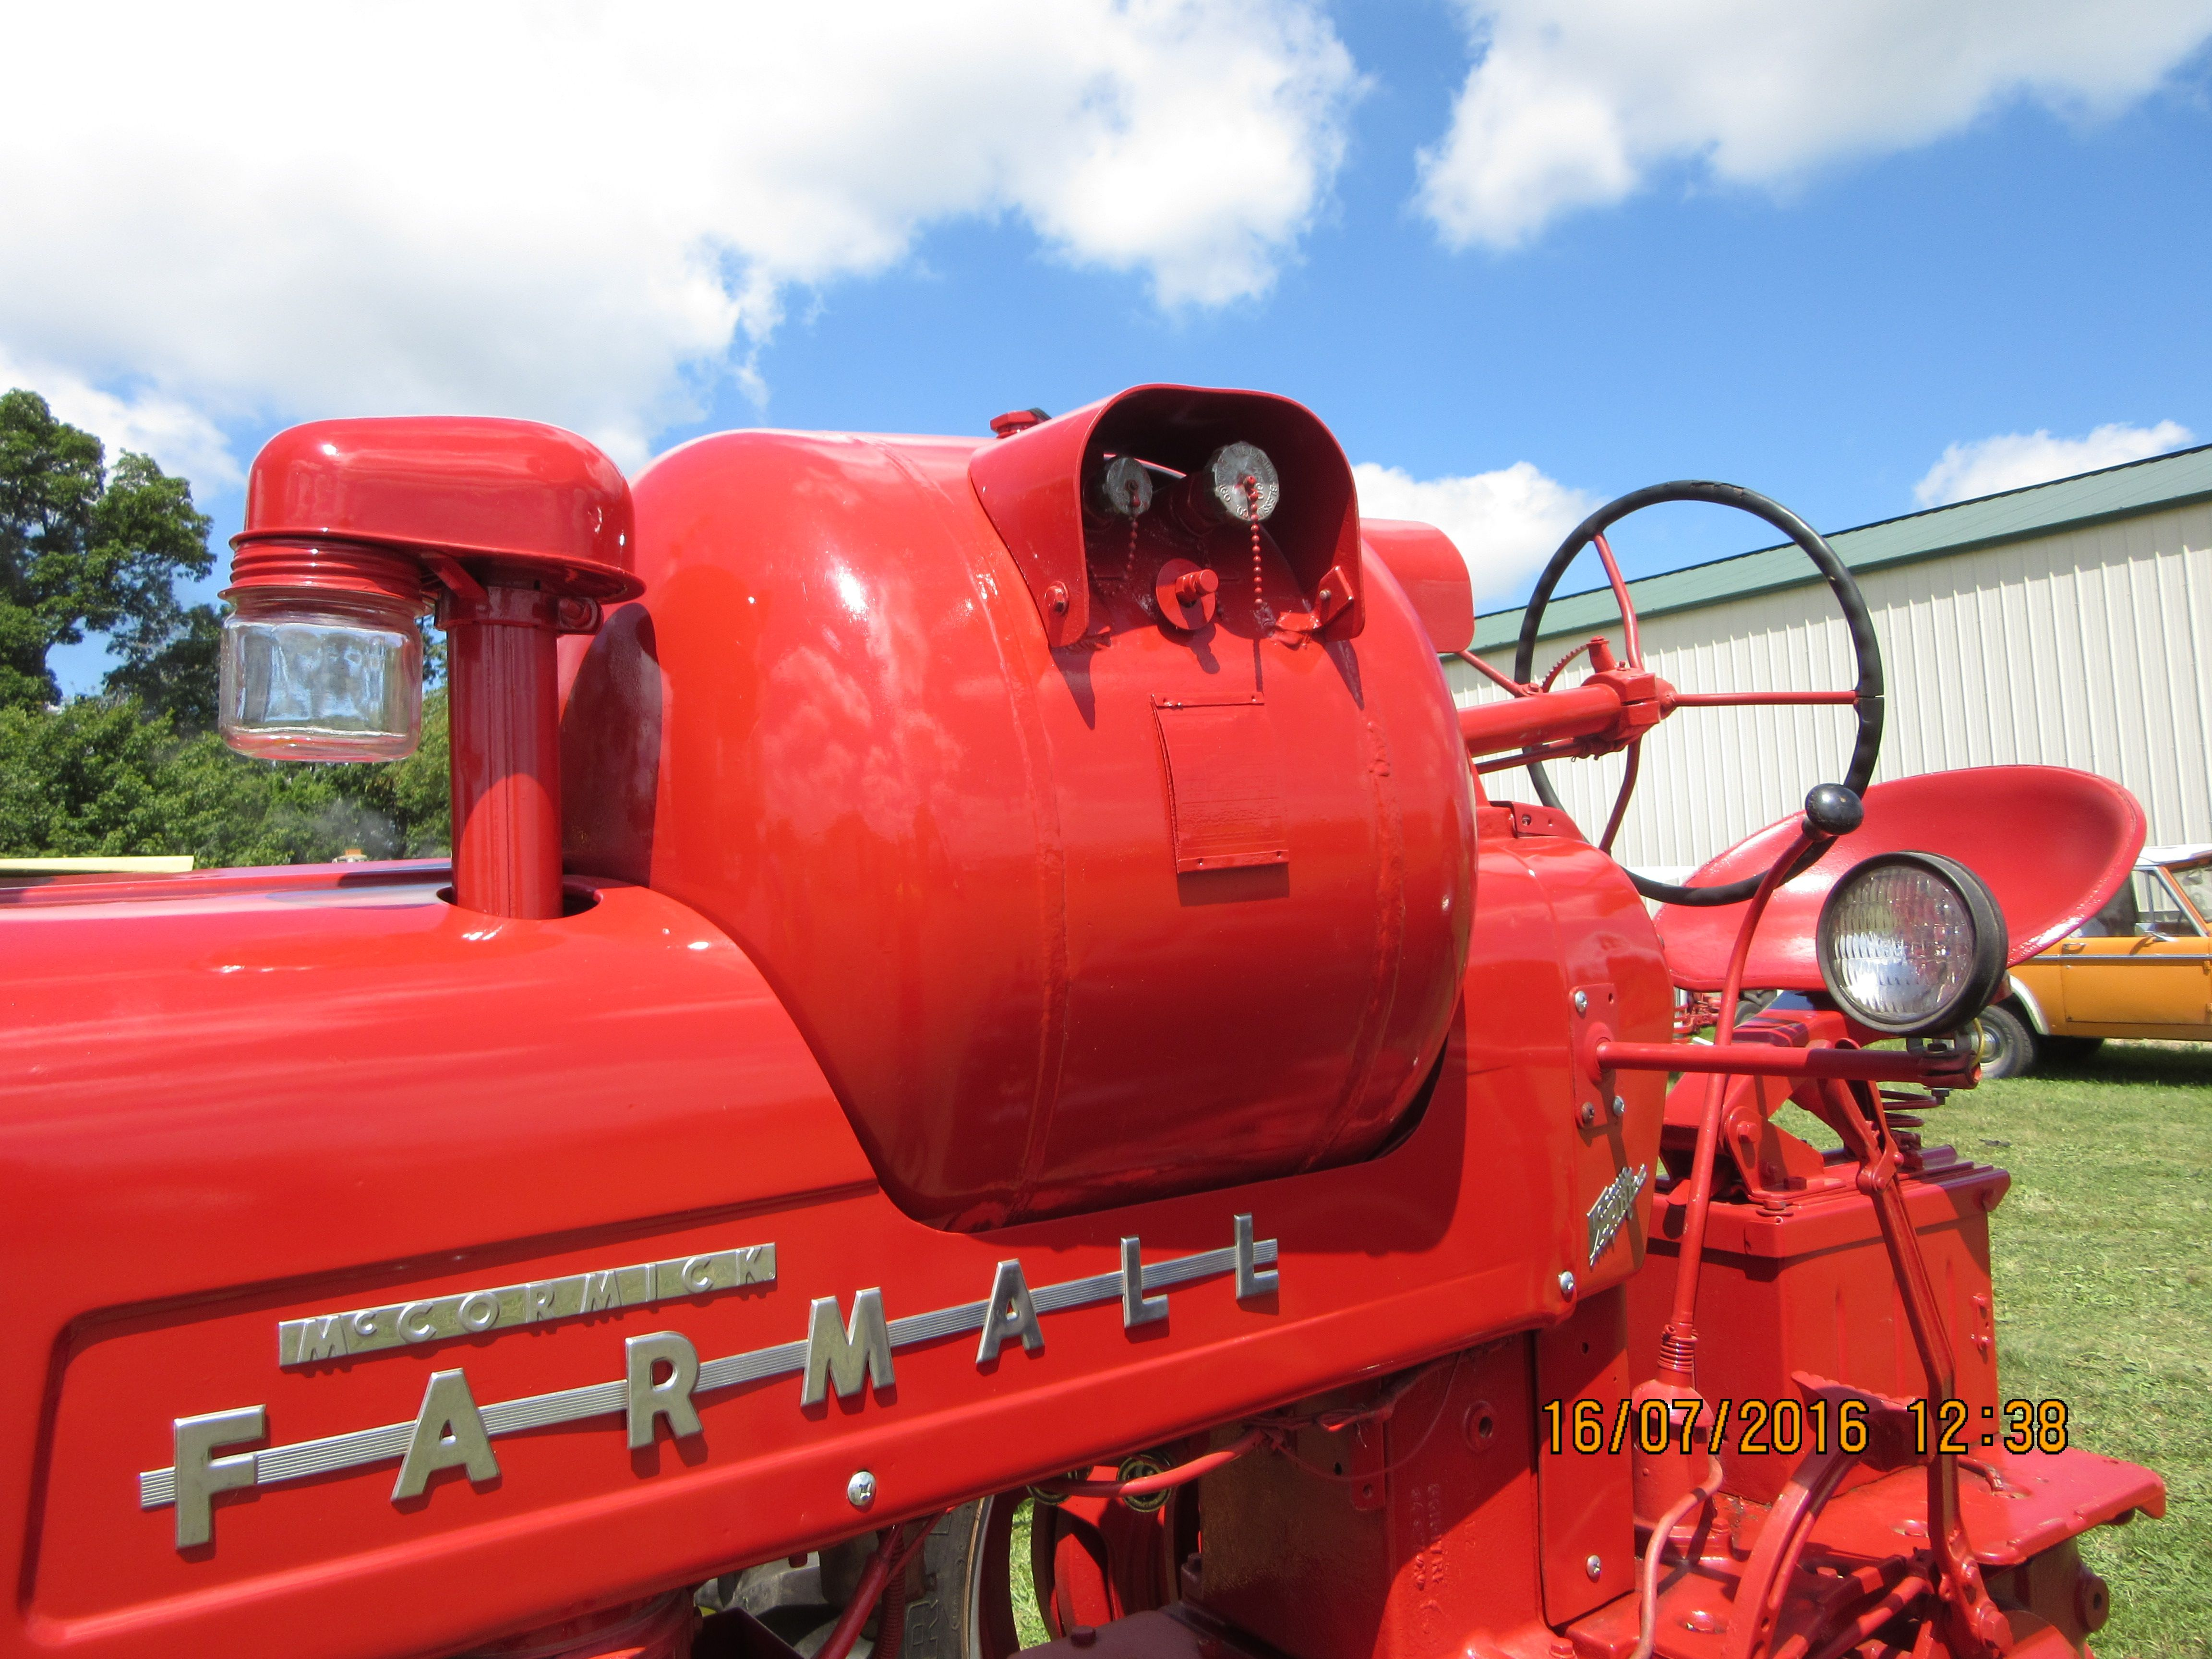 medium resolution of closeup of 1955 farmall 400 lpg red tractor tractors case ih international harvester